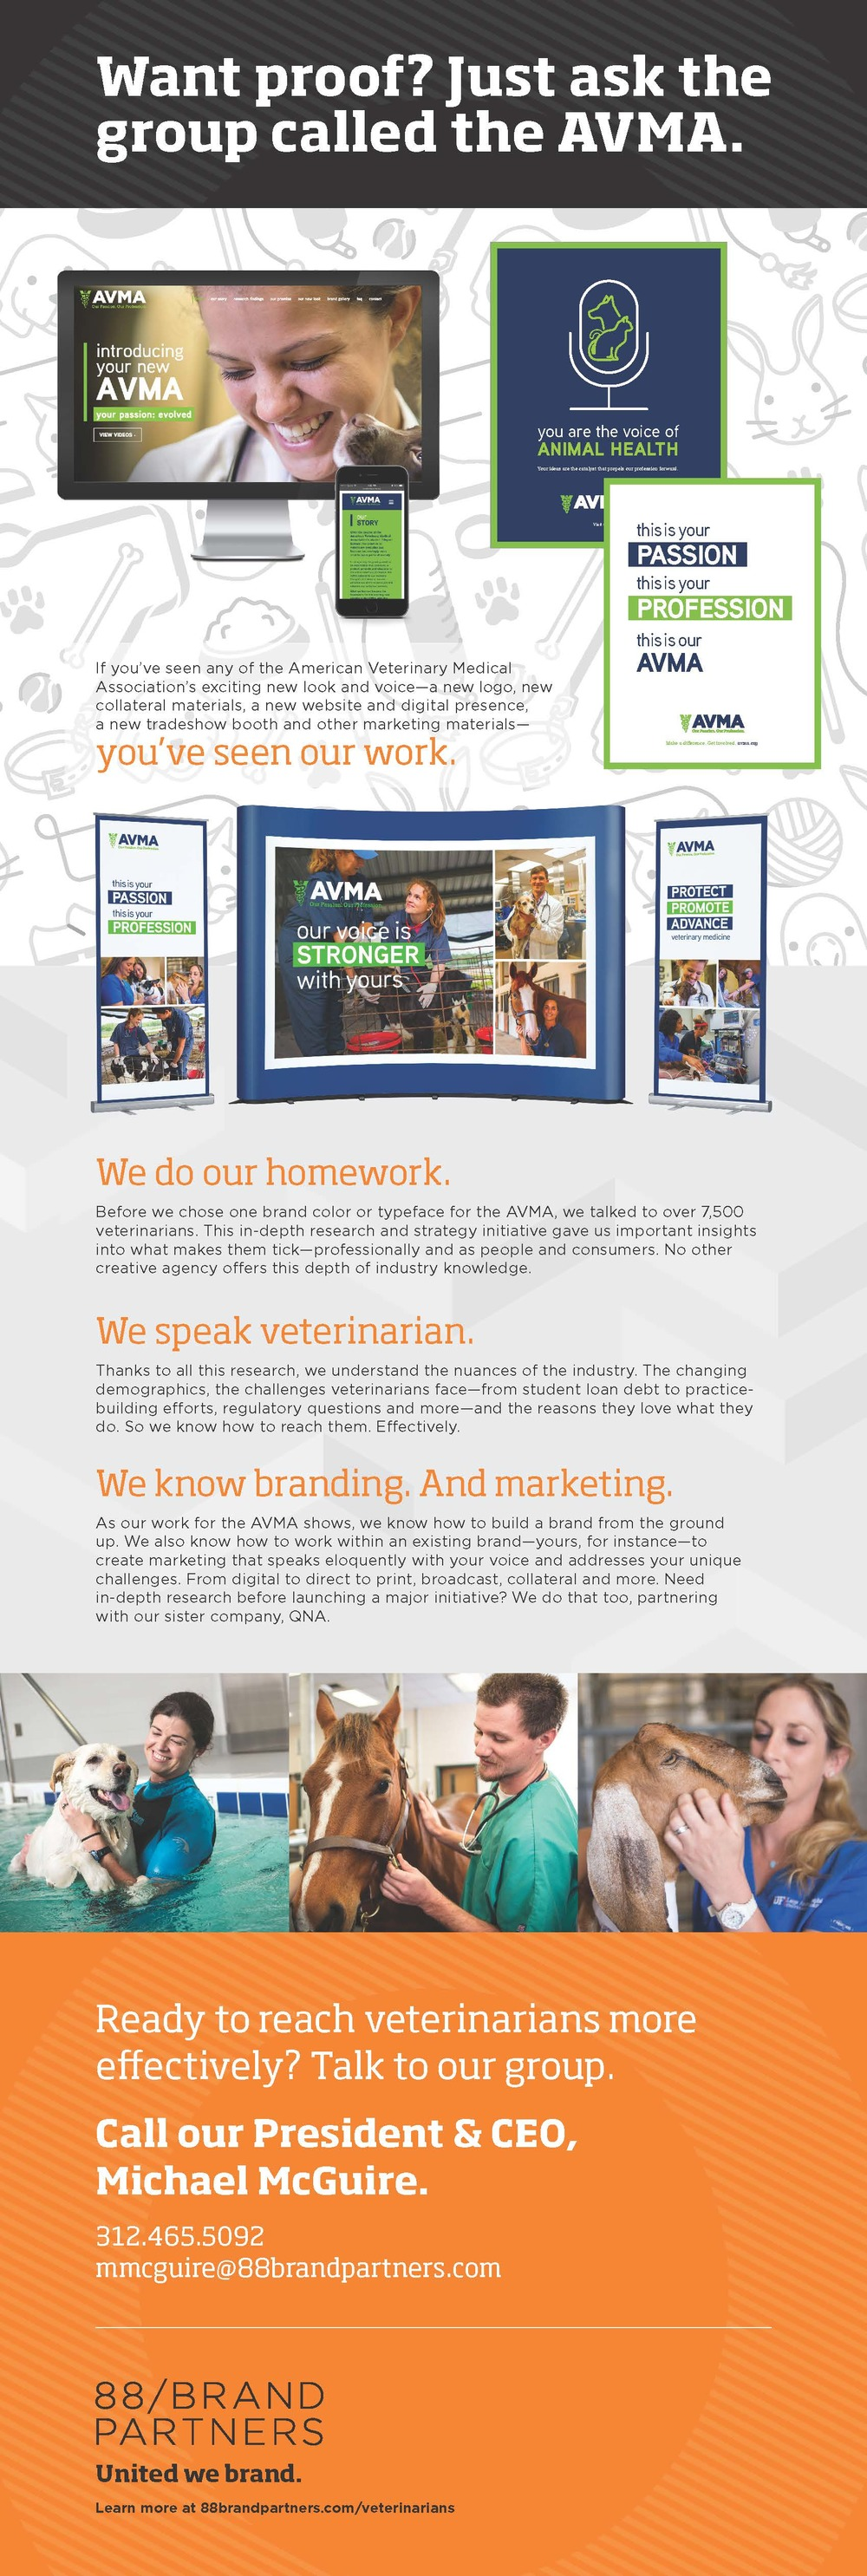 marketing-infographic-elenapotter.jpg